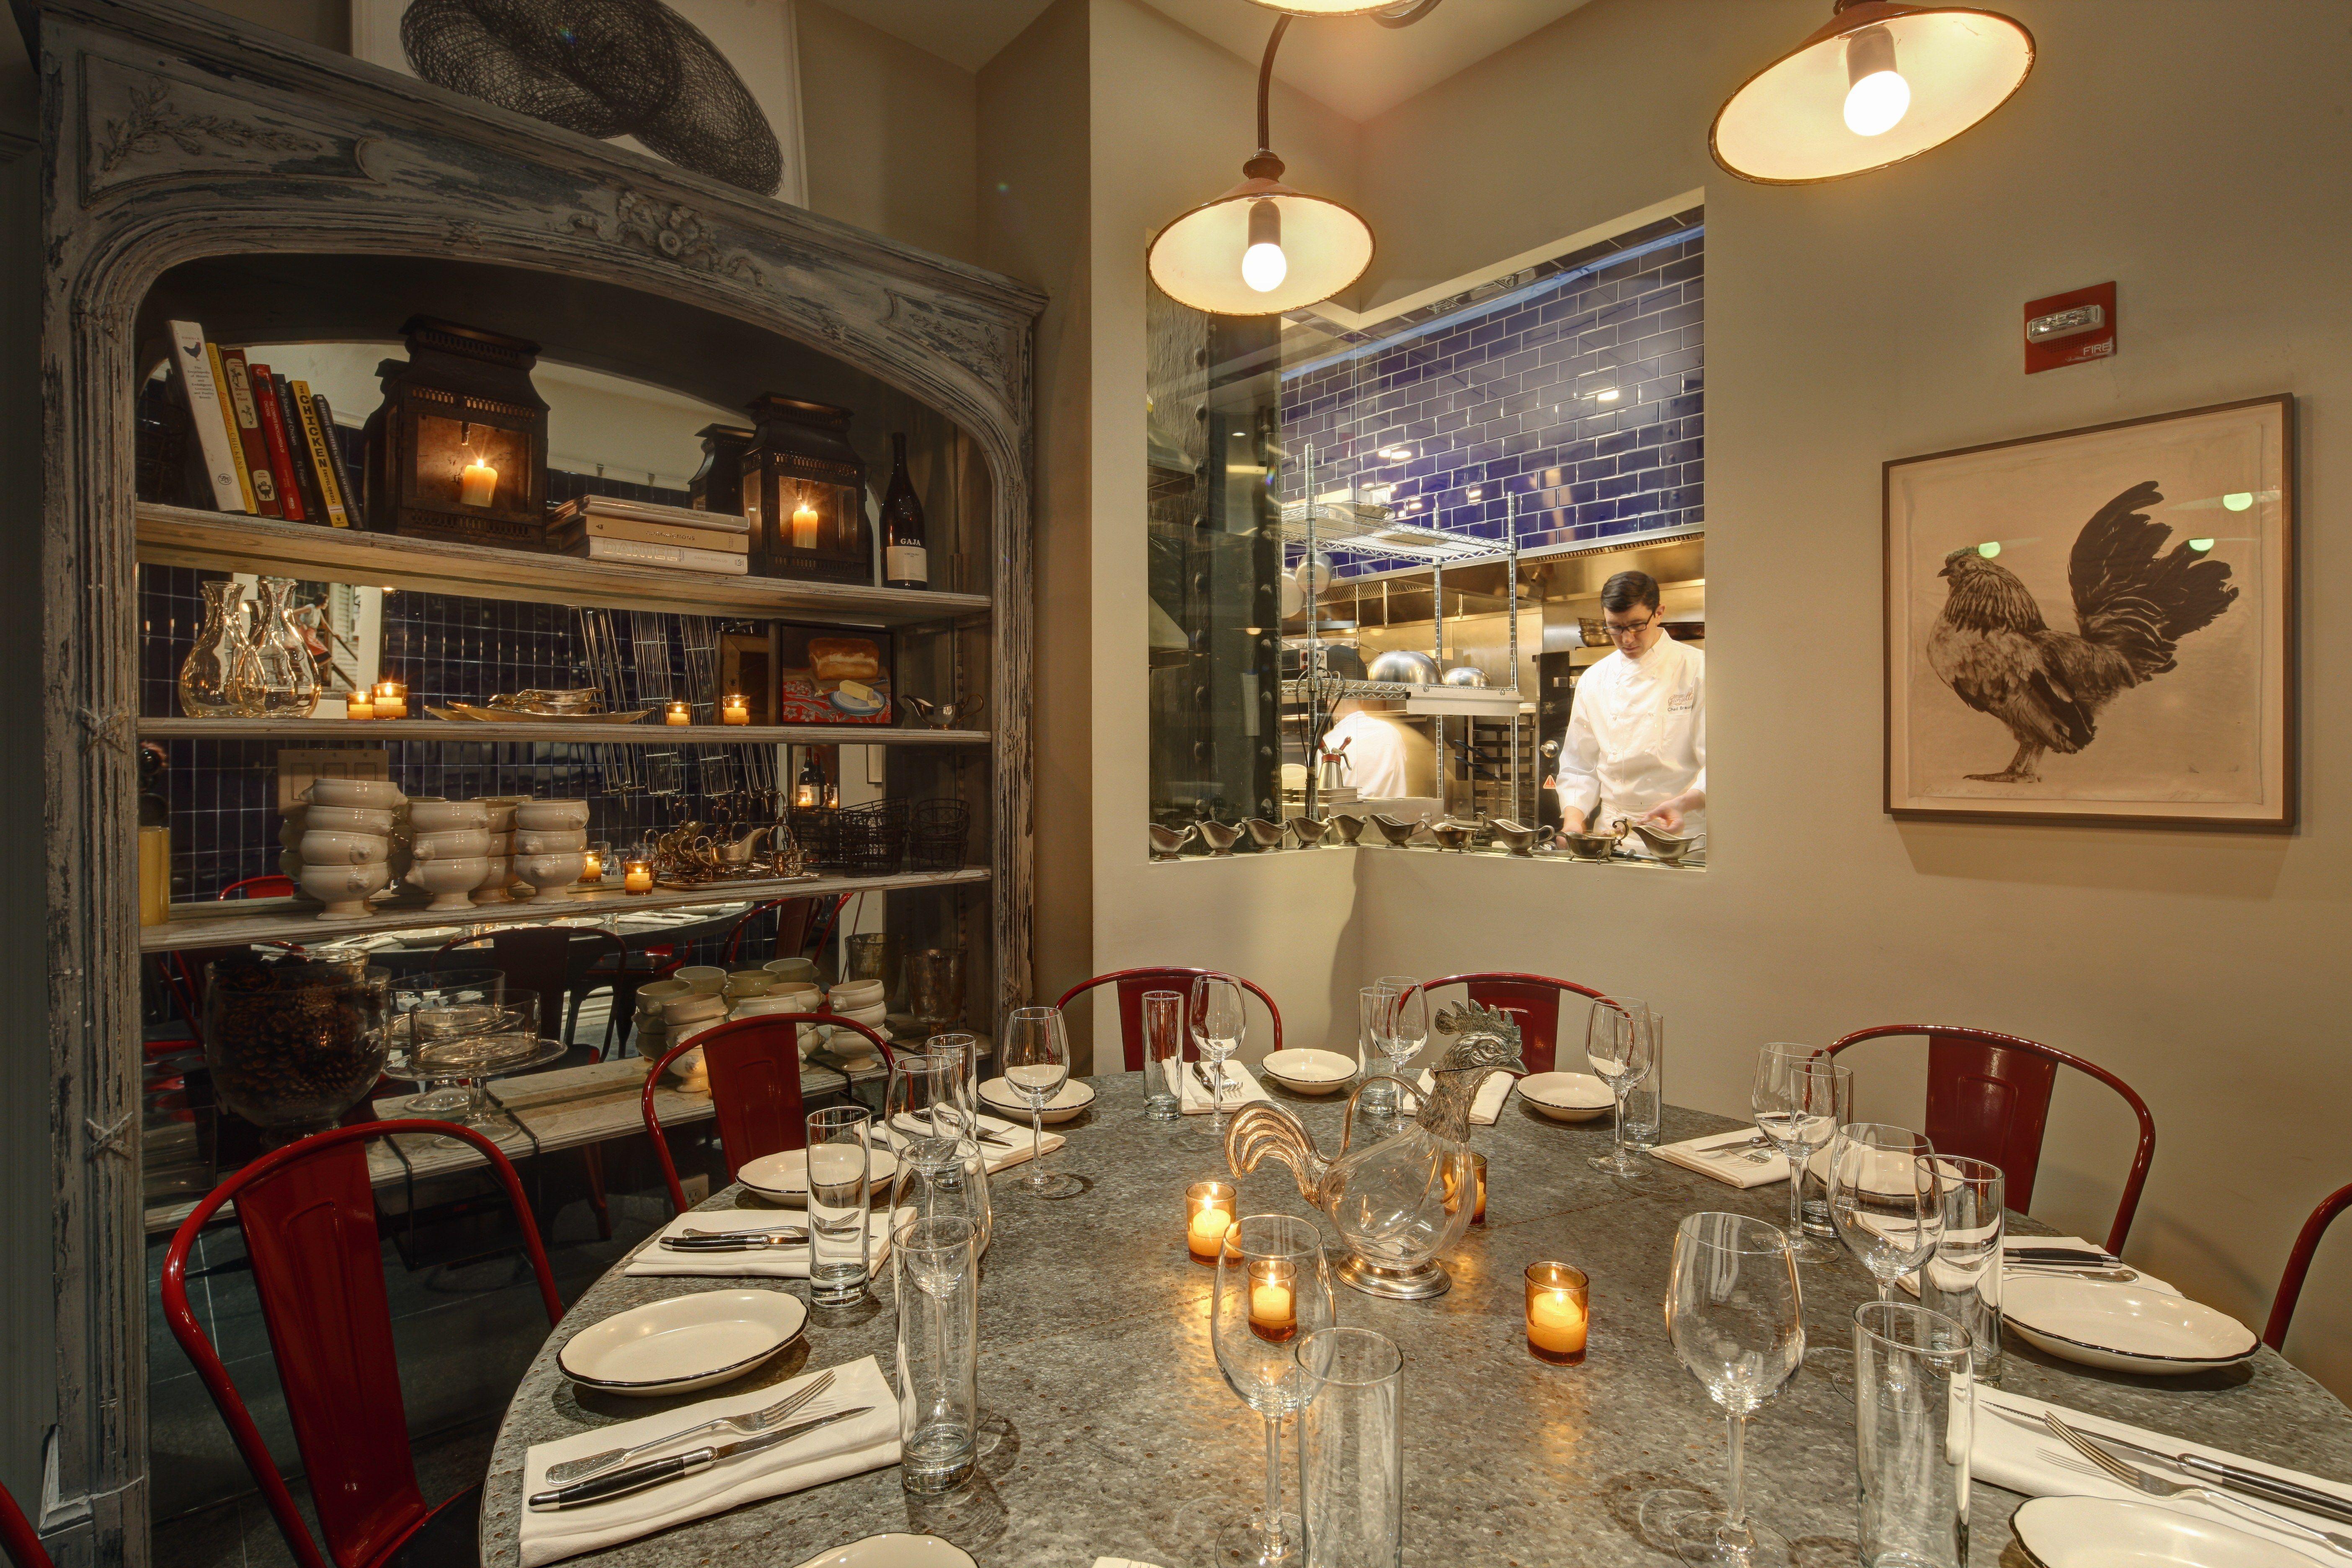 8 Impressive Private Dining Rooms In New York Restaurants  Dining Endearing Private Dining Room Nyc 2018